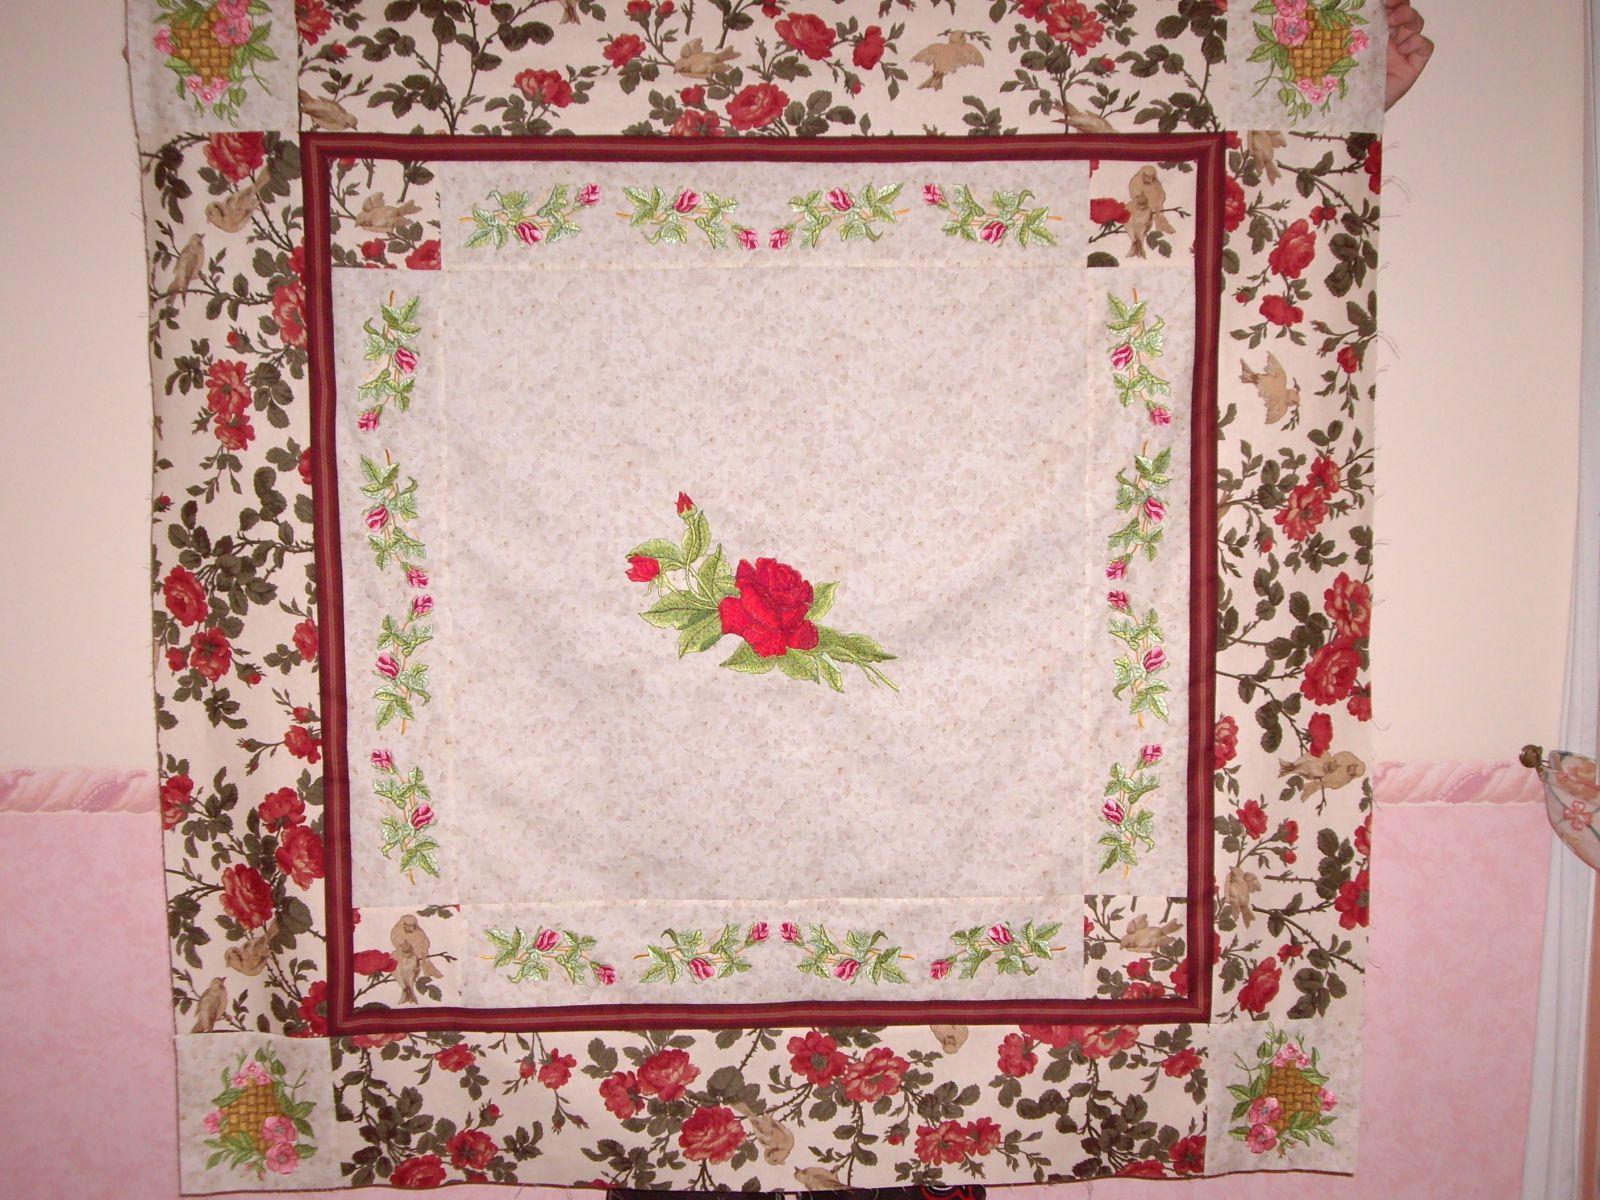 Rose garden blanket embroidered quilt